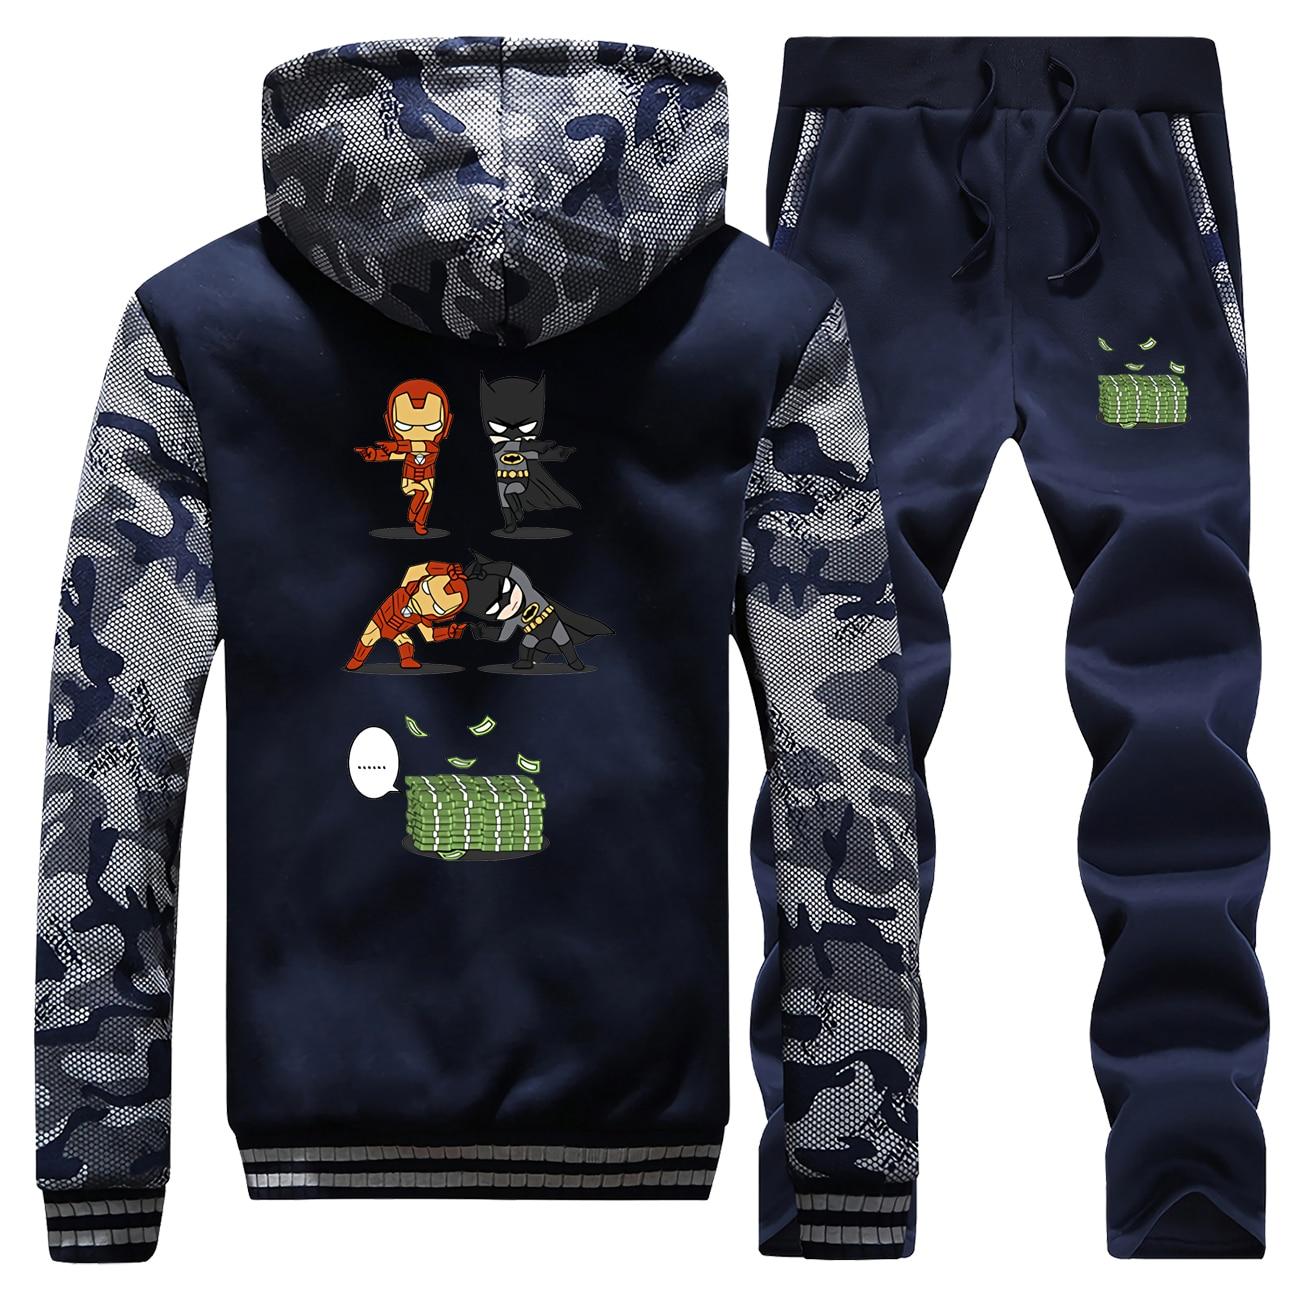 Iron Man Tony Stark Tracksuits Pant Set Men Batman Bruce Wayne Jackets Sportsuits Sweatpant Sets Suit 2 PCS Camo Coat Sportswear